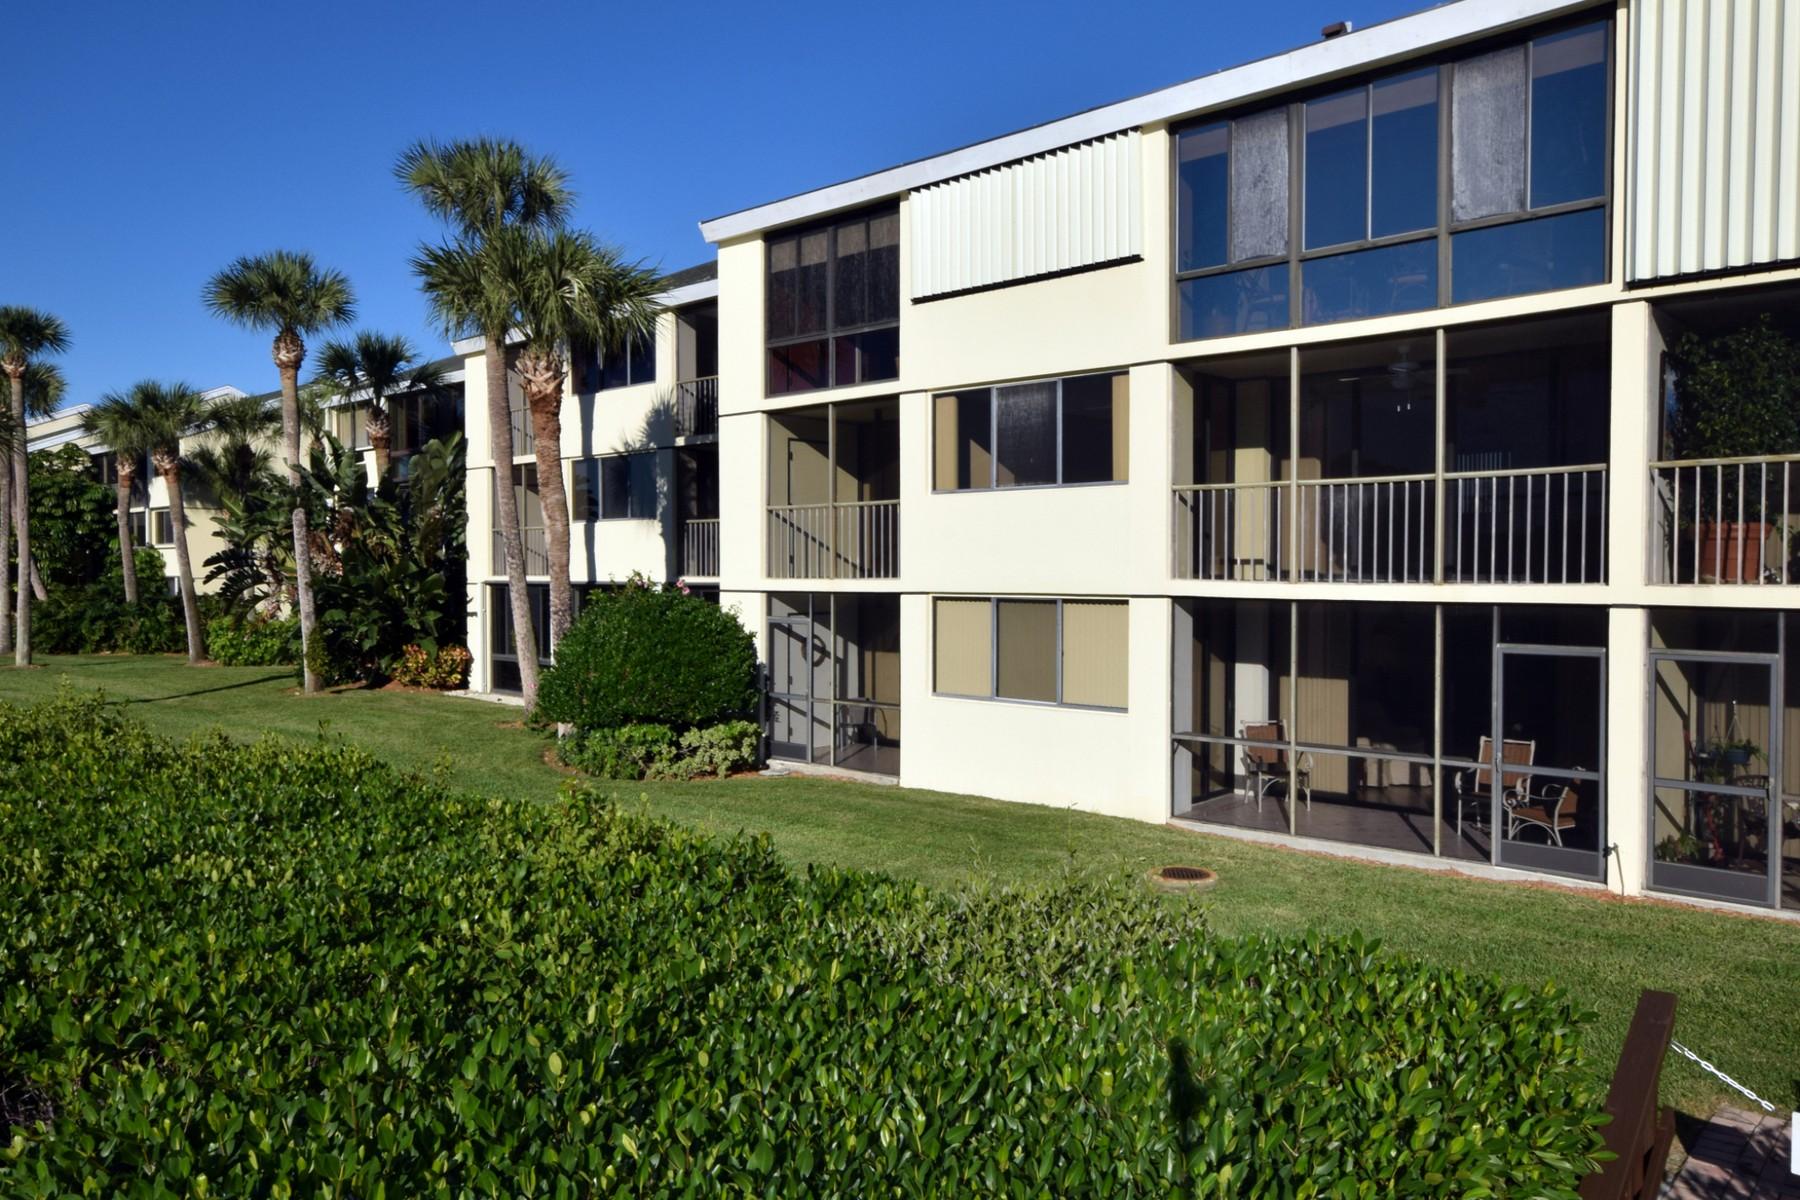 Condominium for Sale at Waterfront Condo in Tarpon Island Club 1825 Tarpon Lane H 204 Vero Beach, Florida, 32960 United States